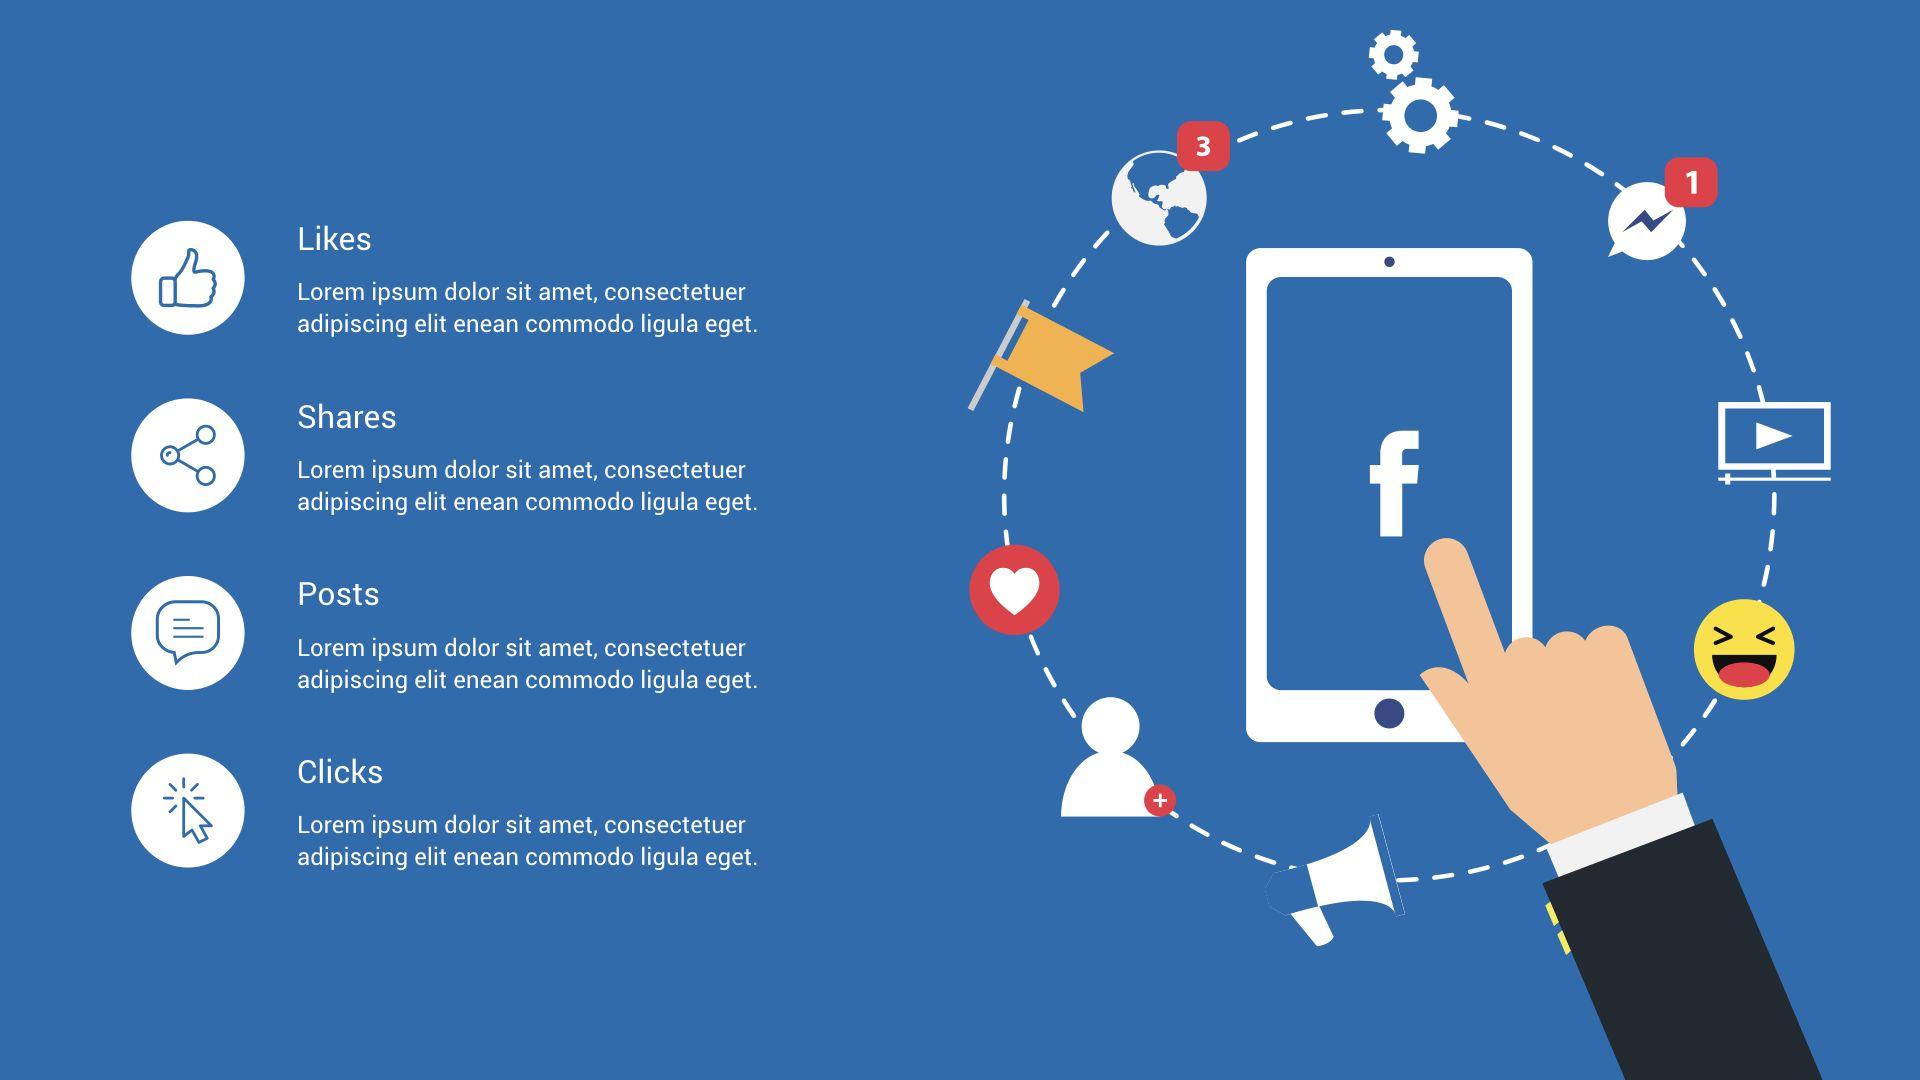 Digital Marketing And Social Media 2 Keynote Presentation